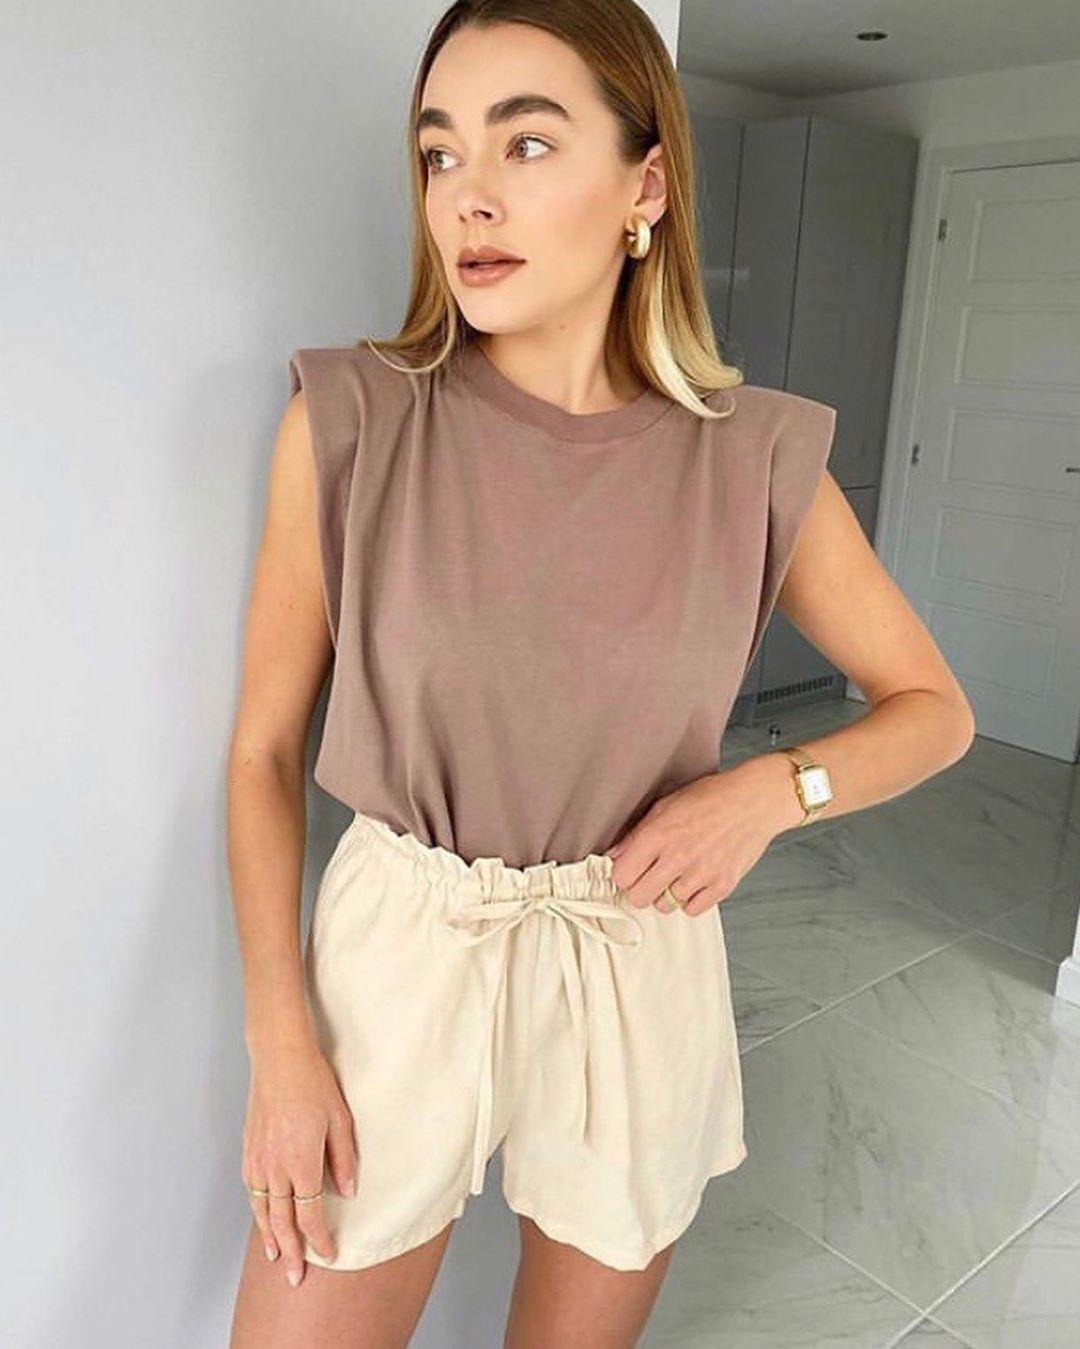 t-shirt with shoulder pads de Zara sur look_by_zara_hm